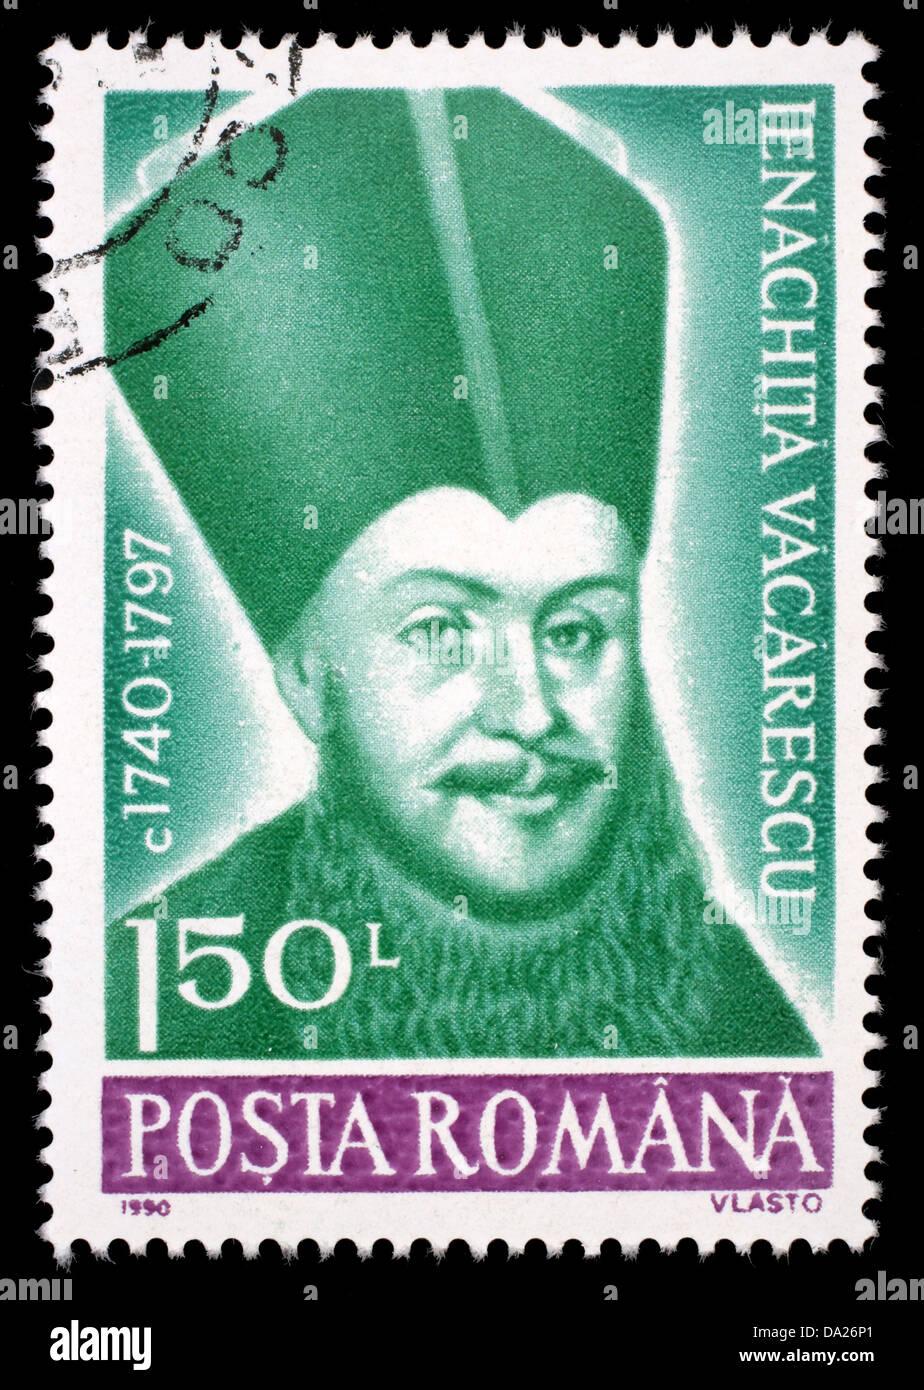 ROMANIA - CIRCA 1990: A stamp printed in Romania, shows portrait of Ienachita Vacarescu, 1740 - 1797 (poet) - Stock Image